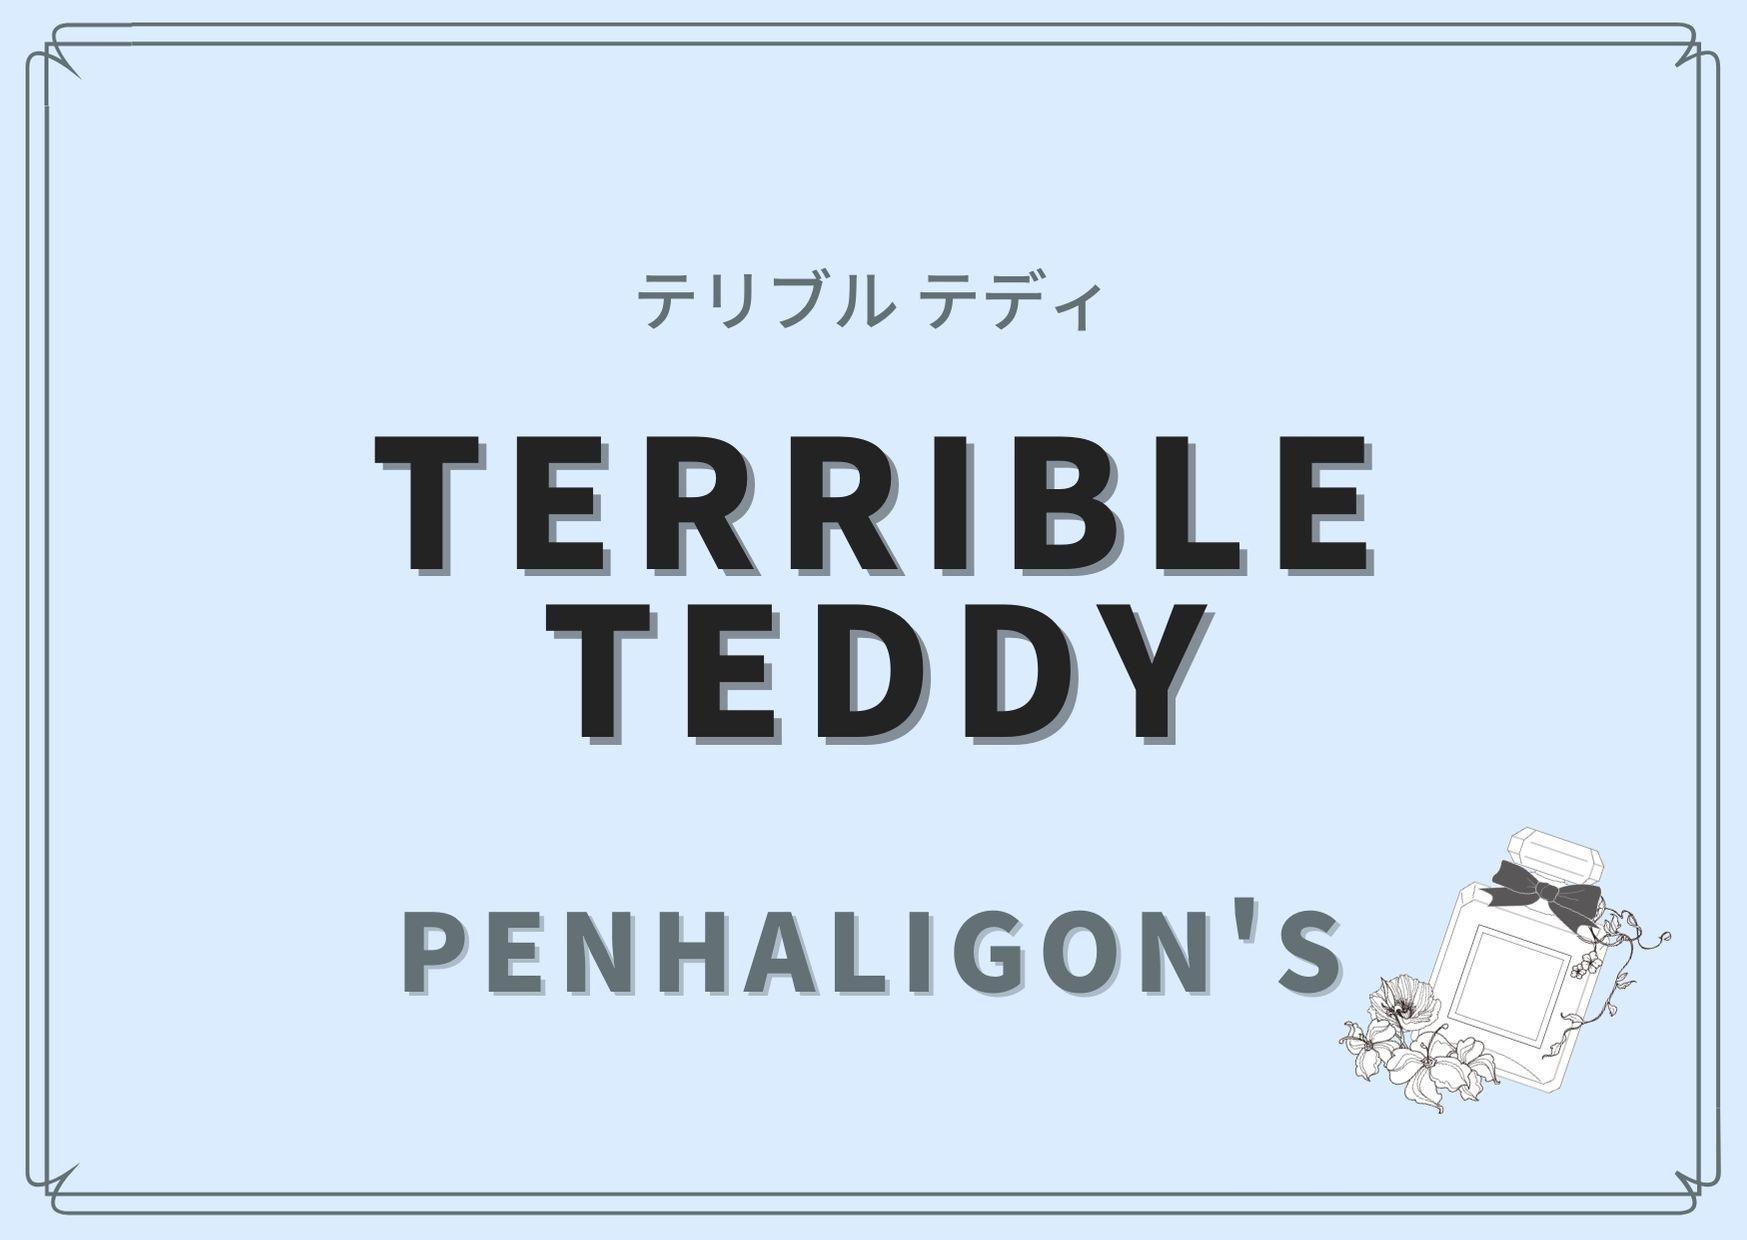 TERRIBLE TEDDY(テリブル テディ)/PENHALIGON'S(ペンハリガン)